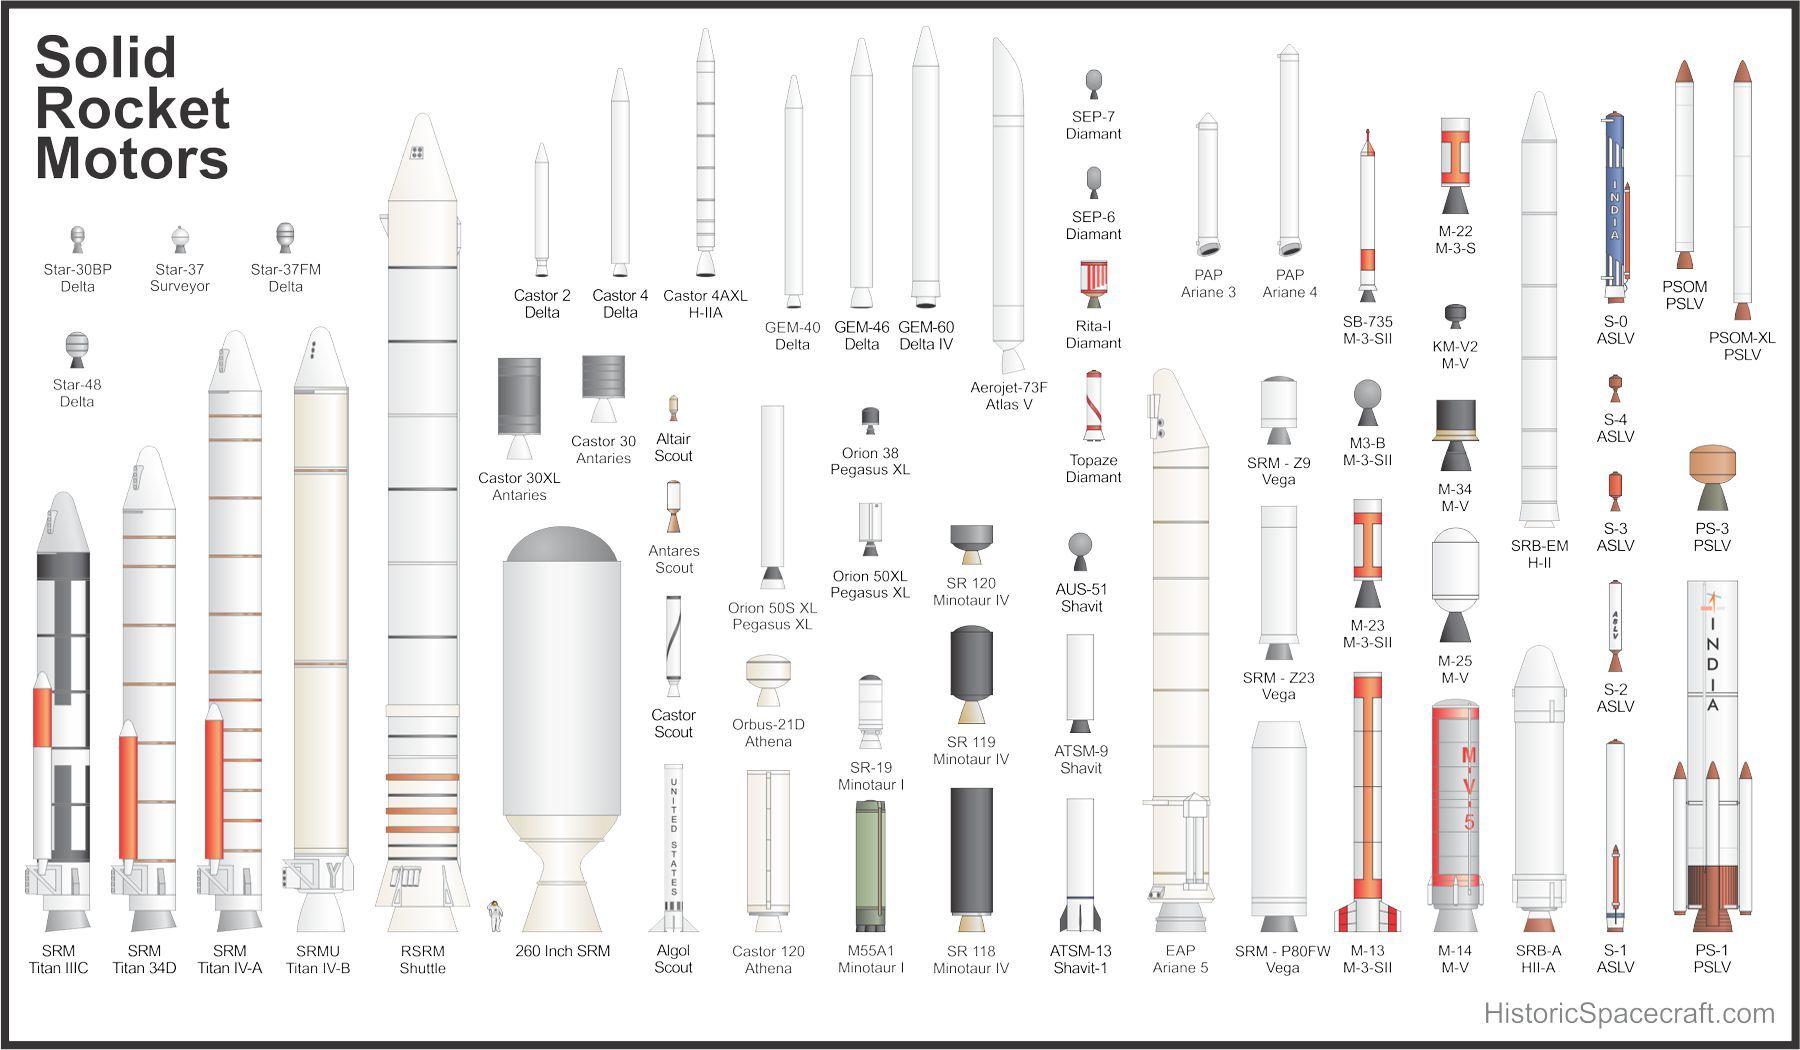 Solid Rocket Motor Comparison Chart